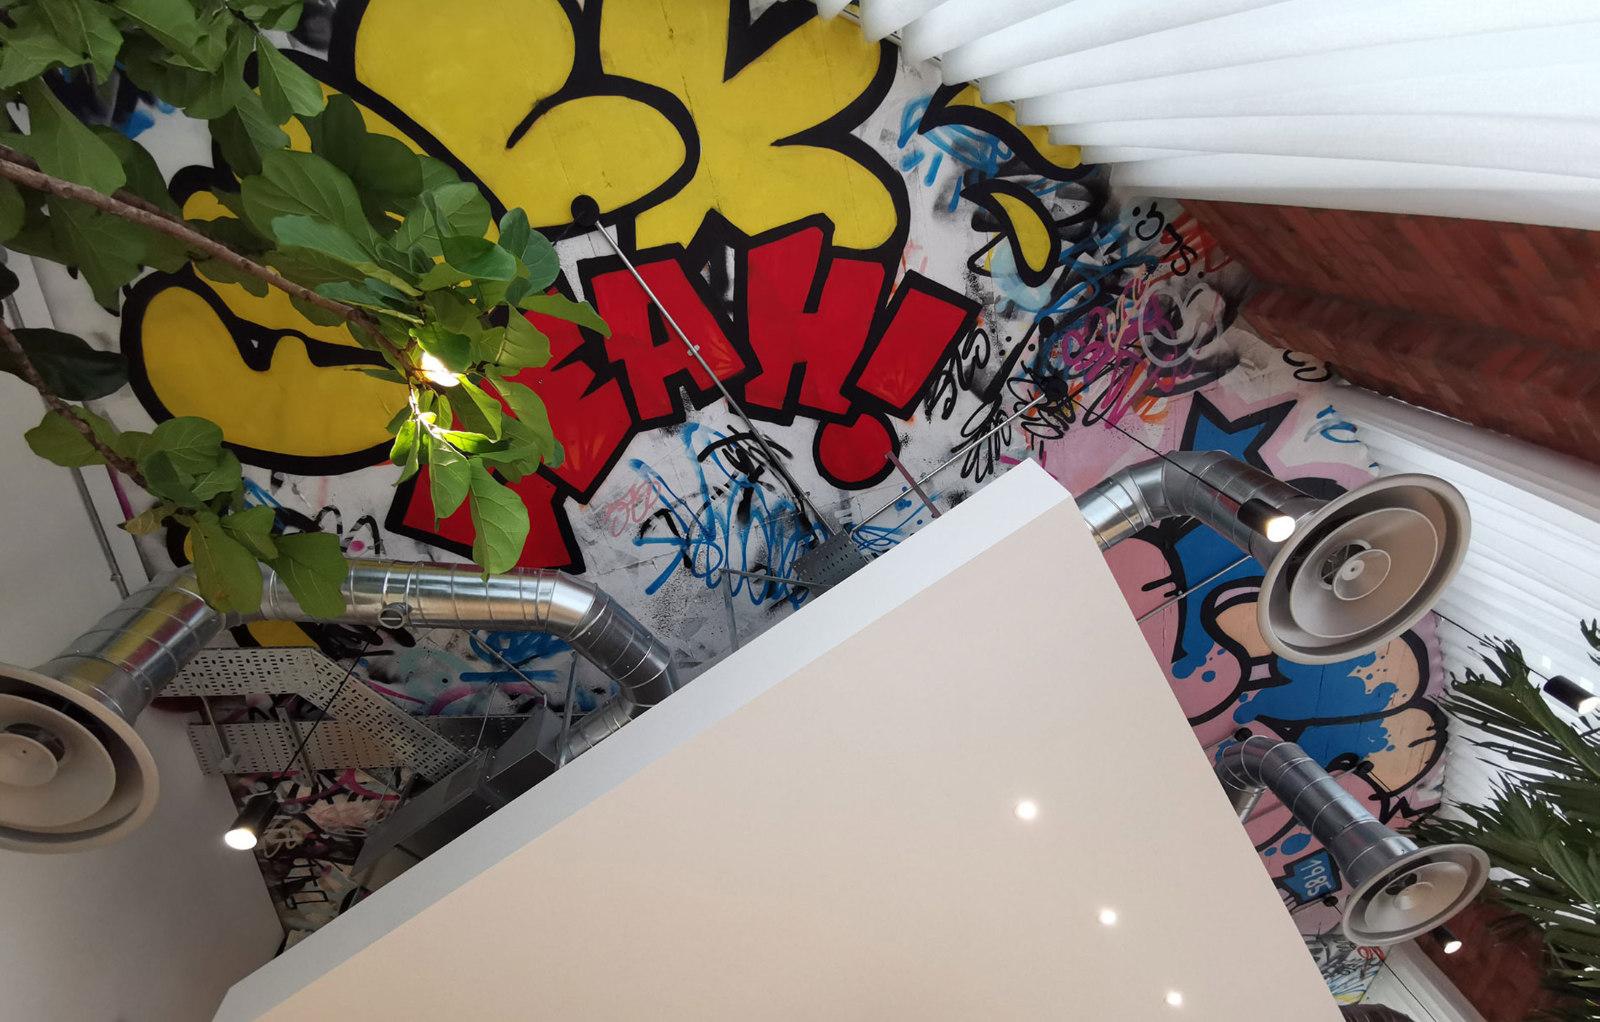 slg-brands-studio-19-boardroom-graffiti